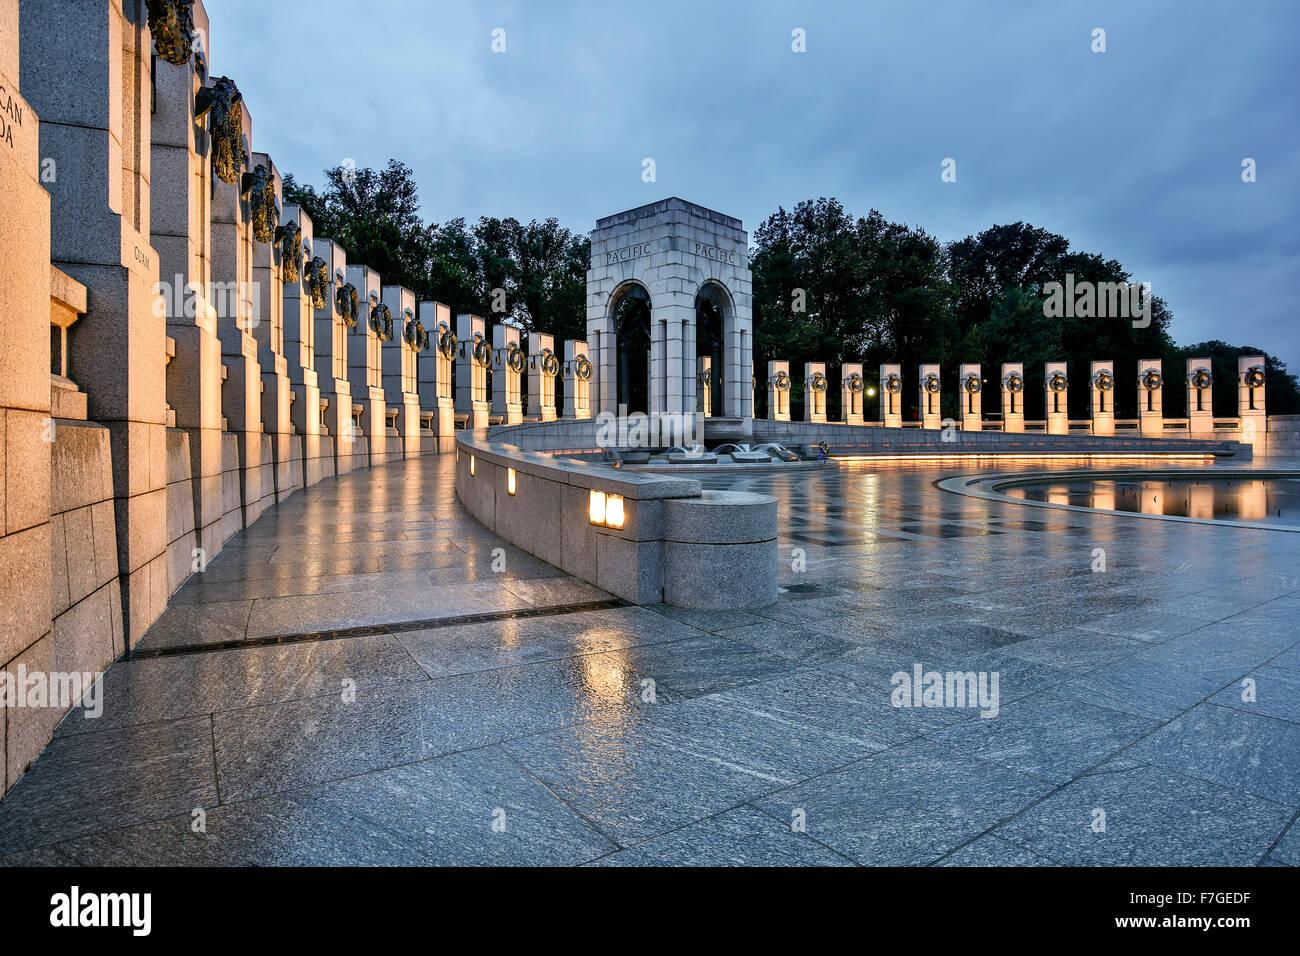 World War II Memorial, Washington, District de Columbia, États-Unis Banque D'Images